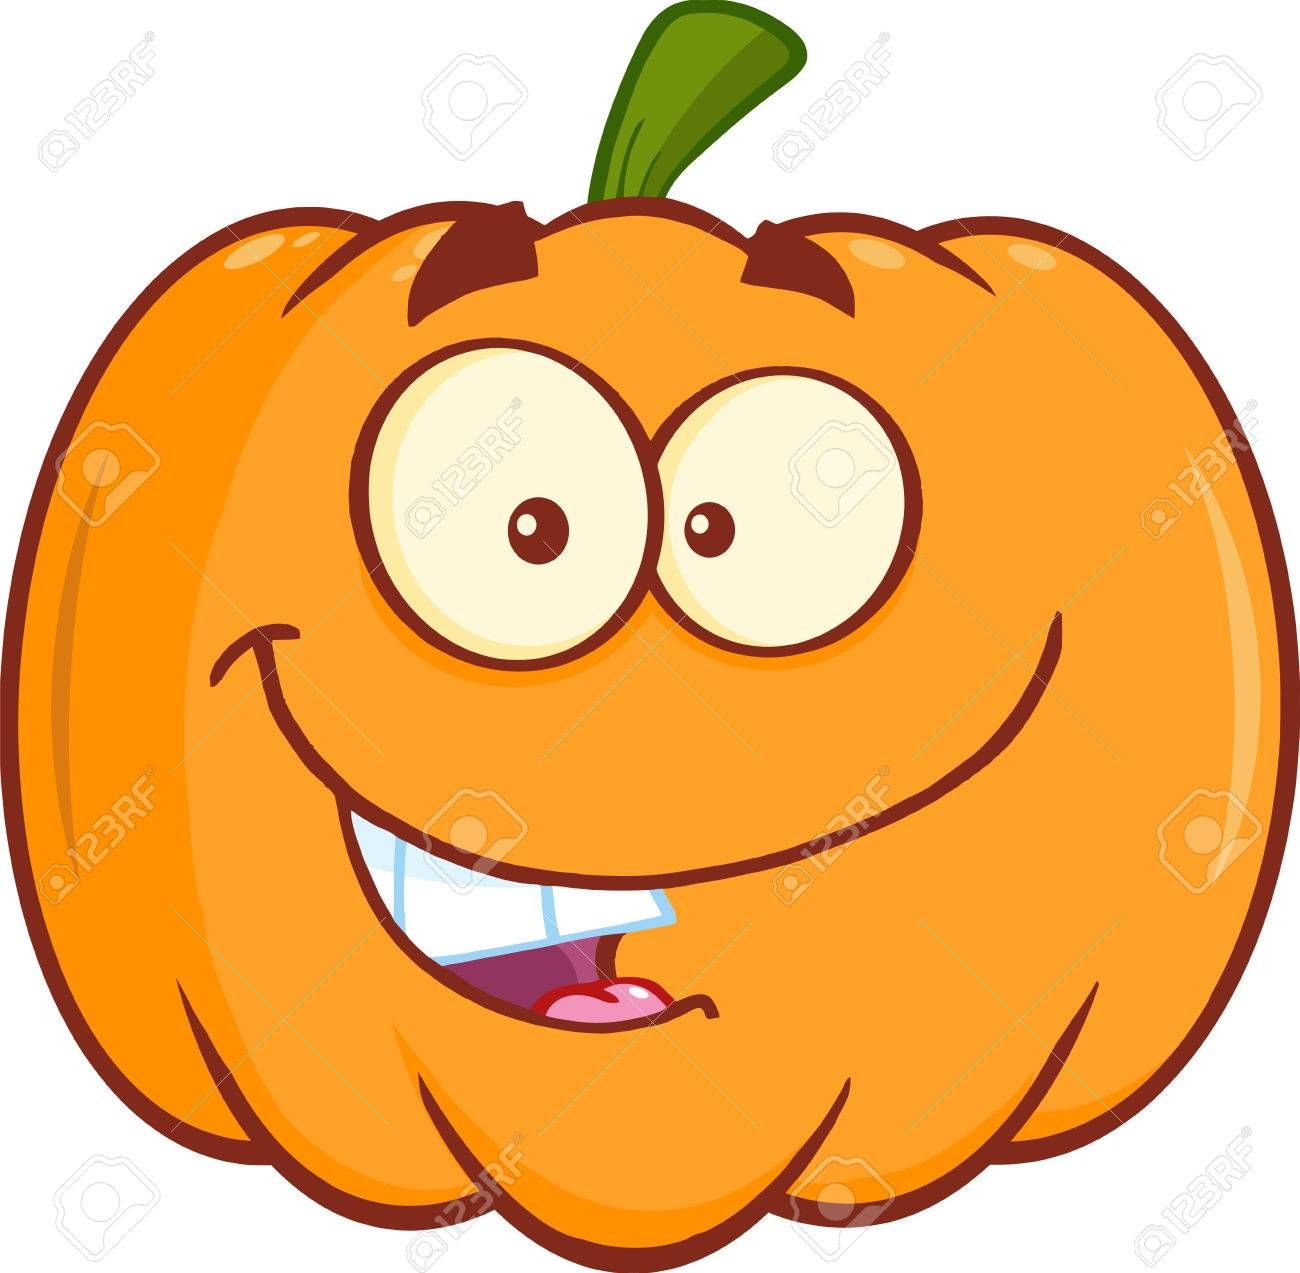 funny halloween pumpkin mascot character royalty free cliparts